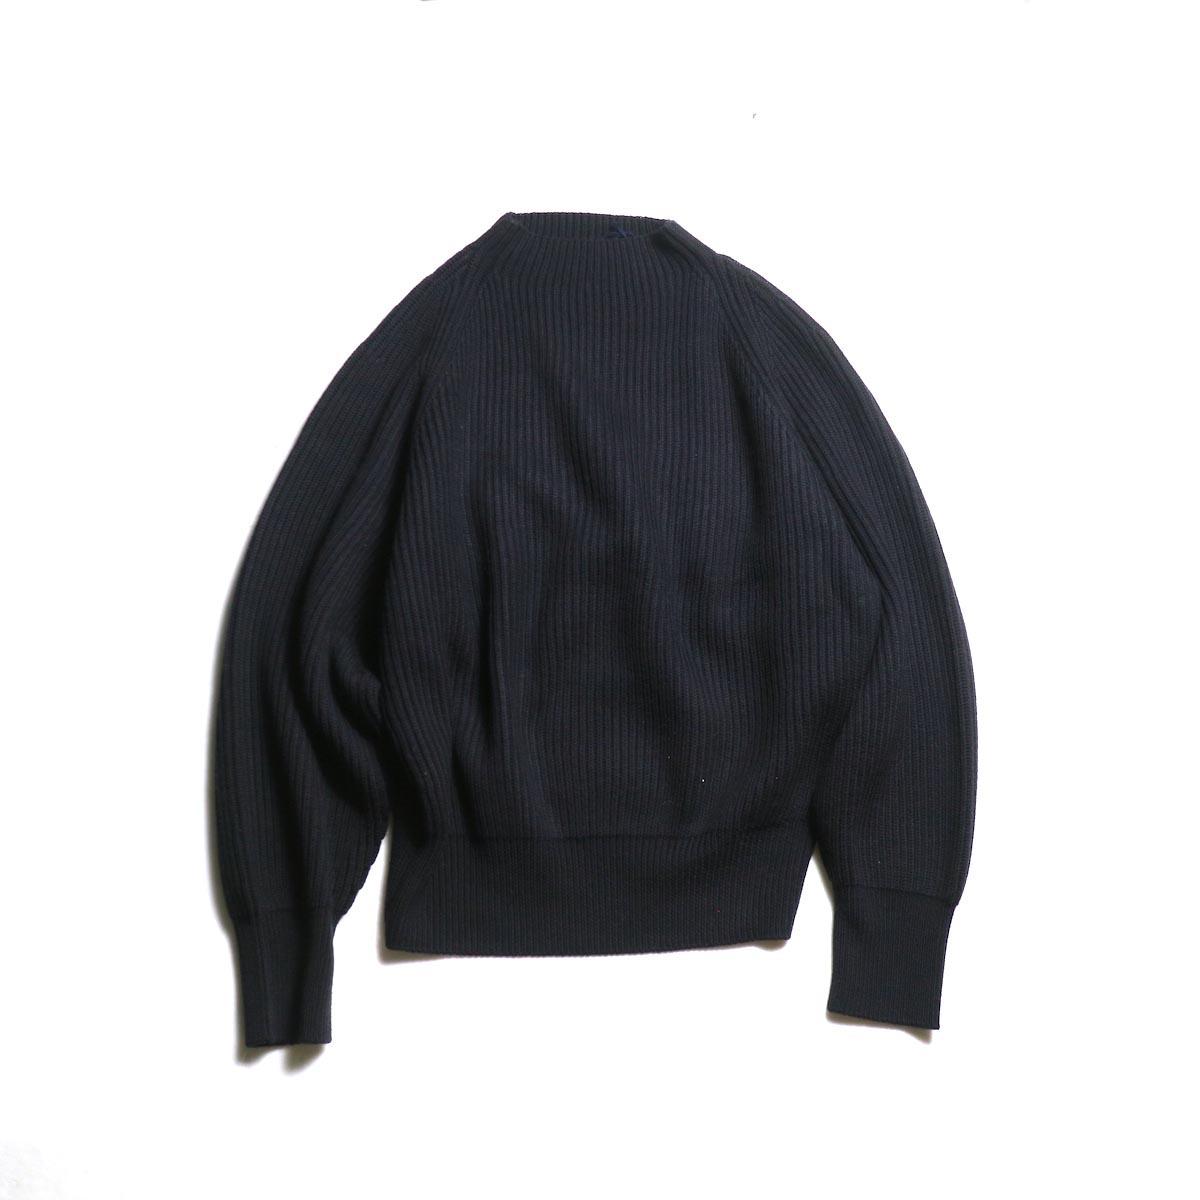 YLEVE / Extrafine Merino Wool KN P/O (Navy)